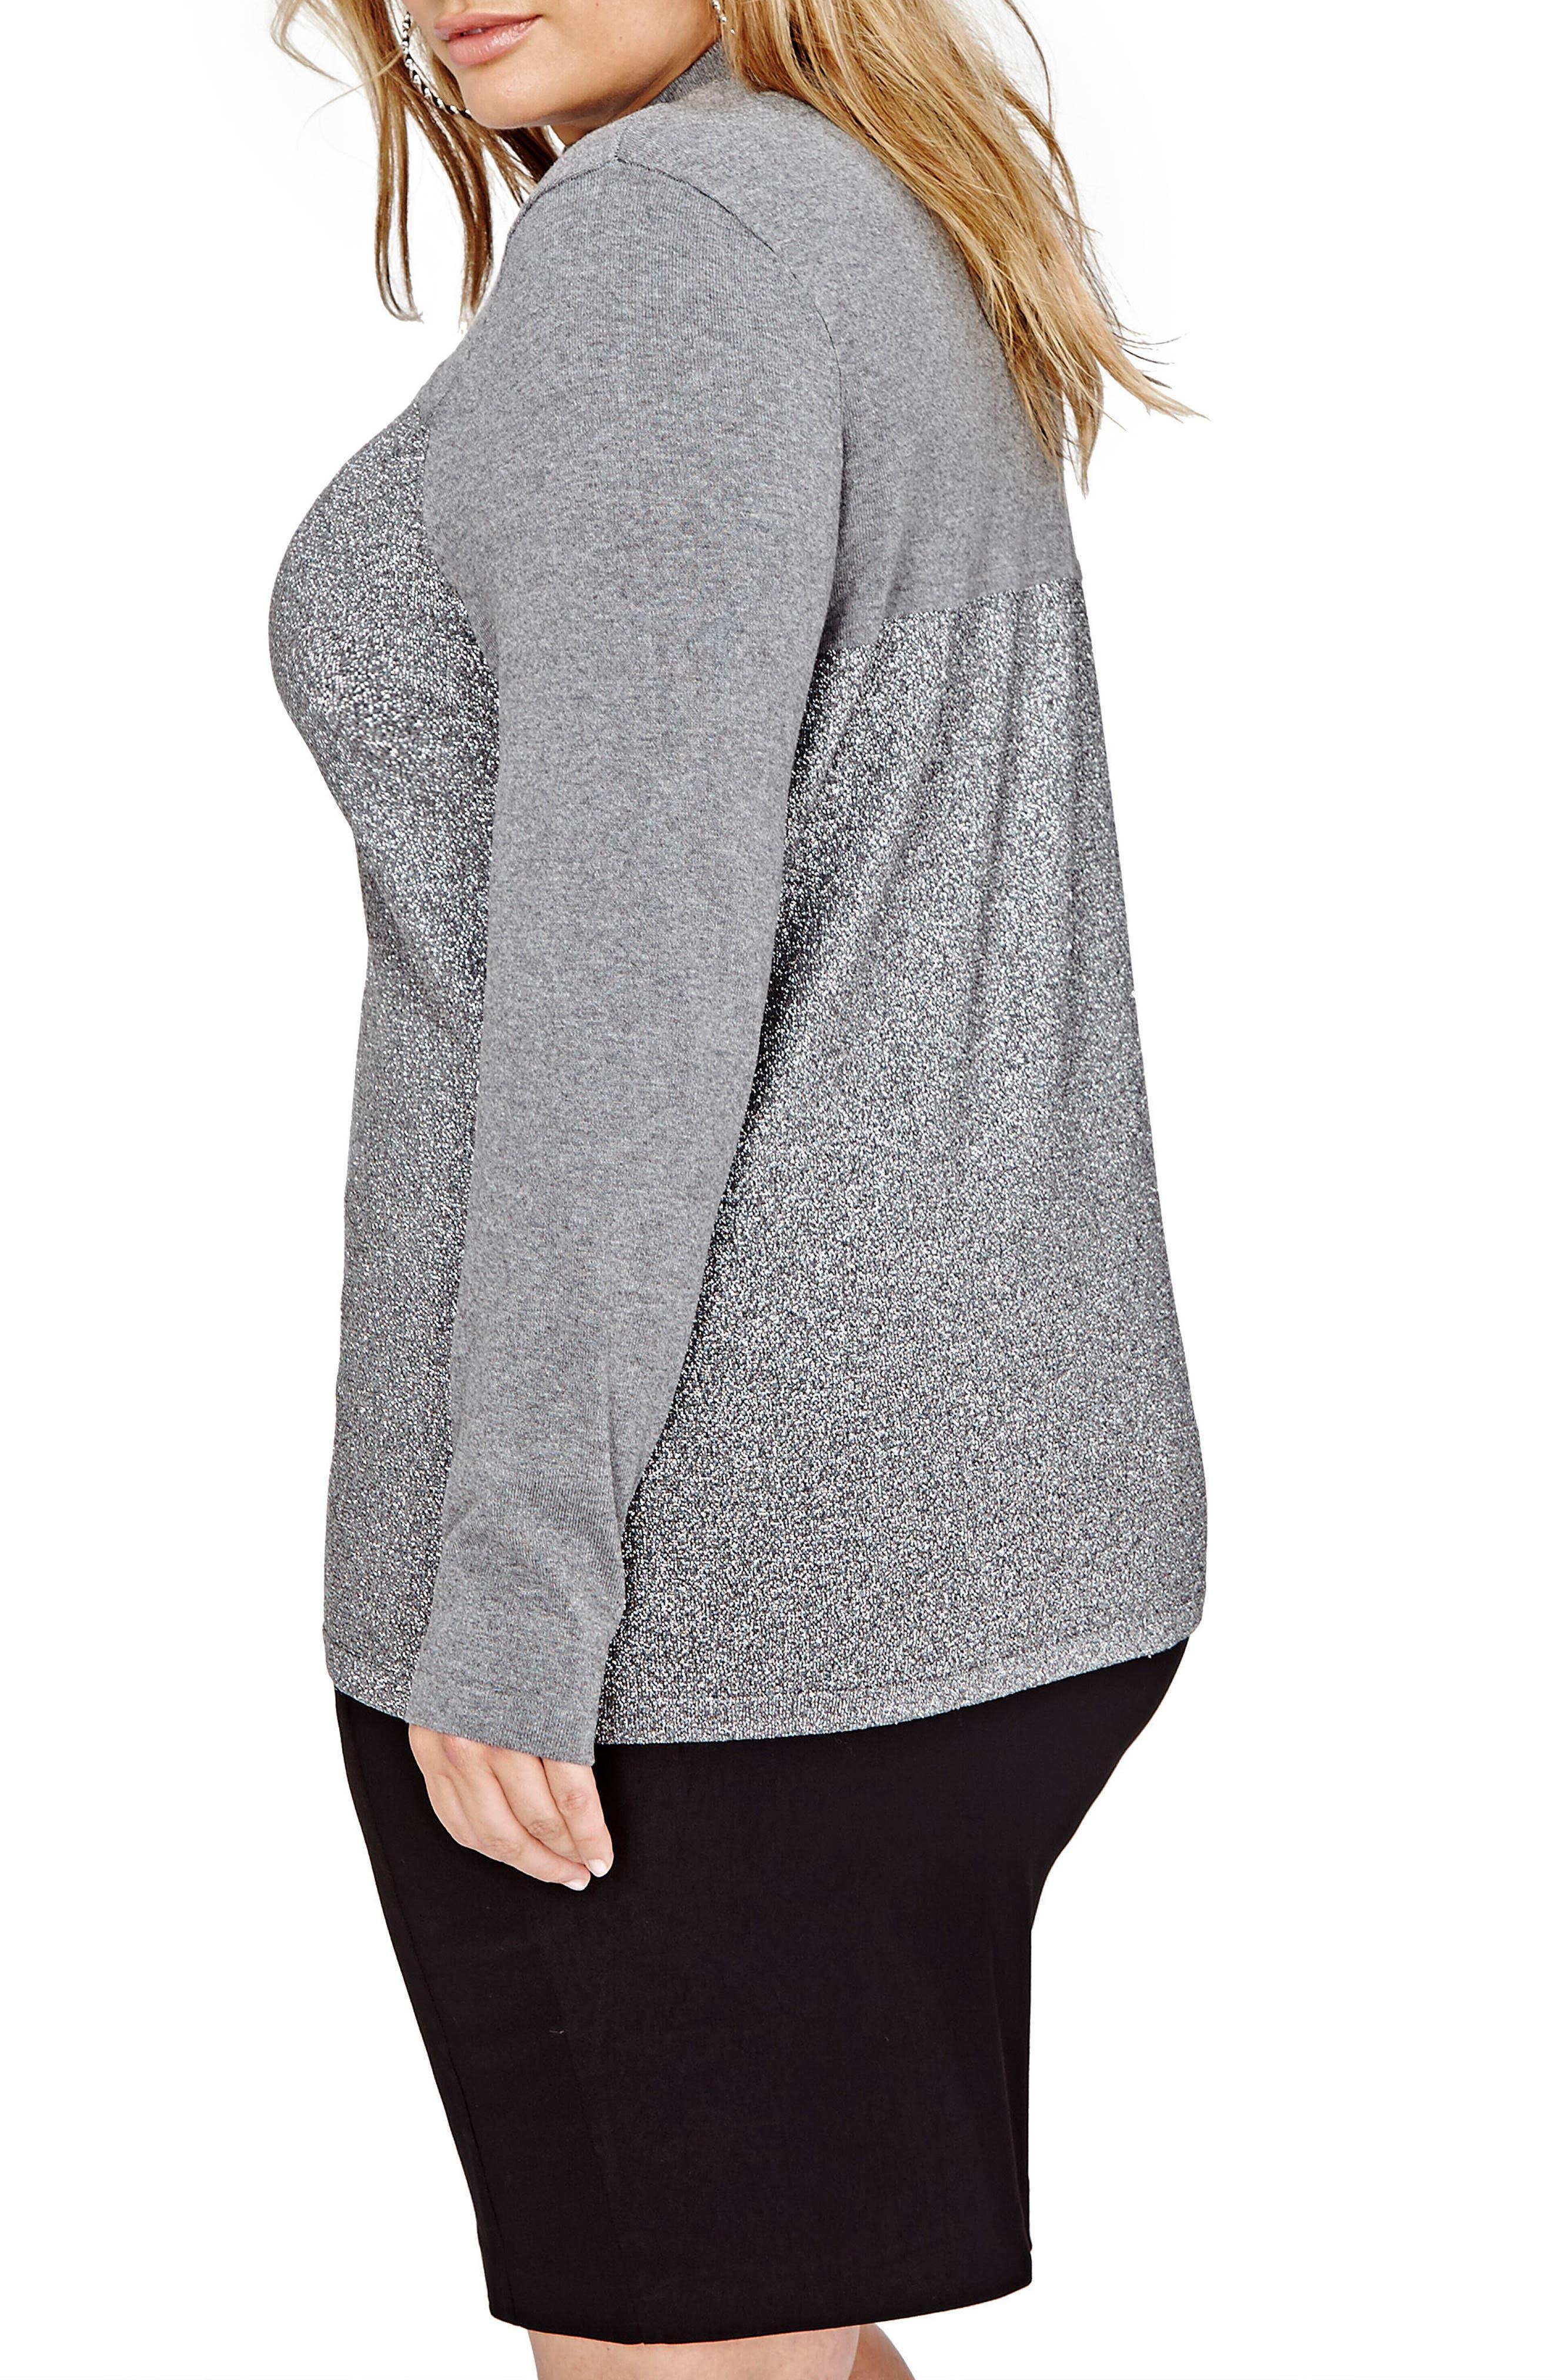 Peekaboo Cutout Sweater,                             Alternate thumbnail 2, color,                             950